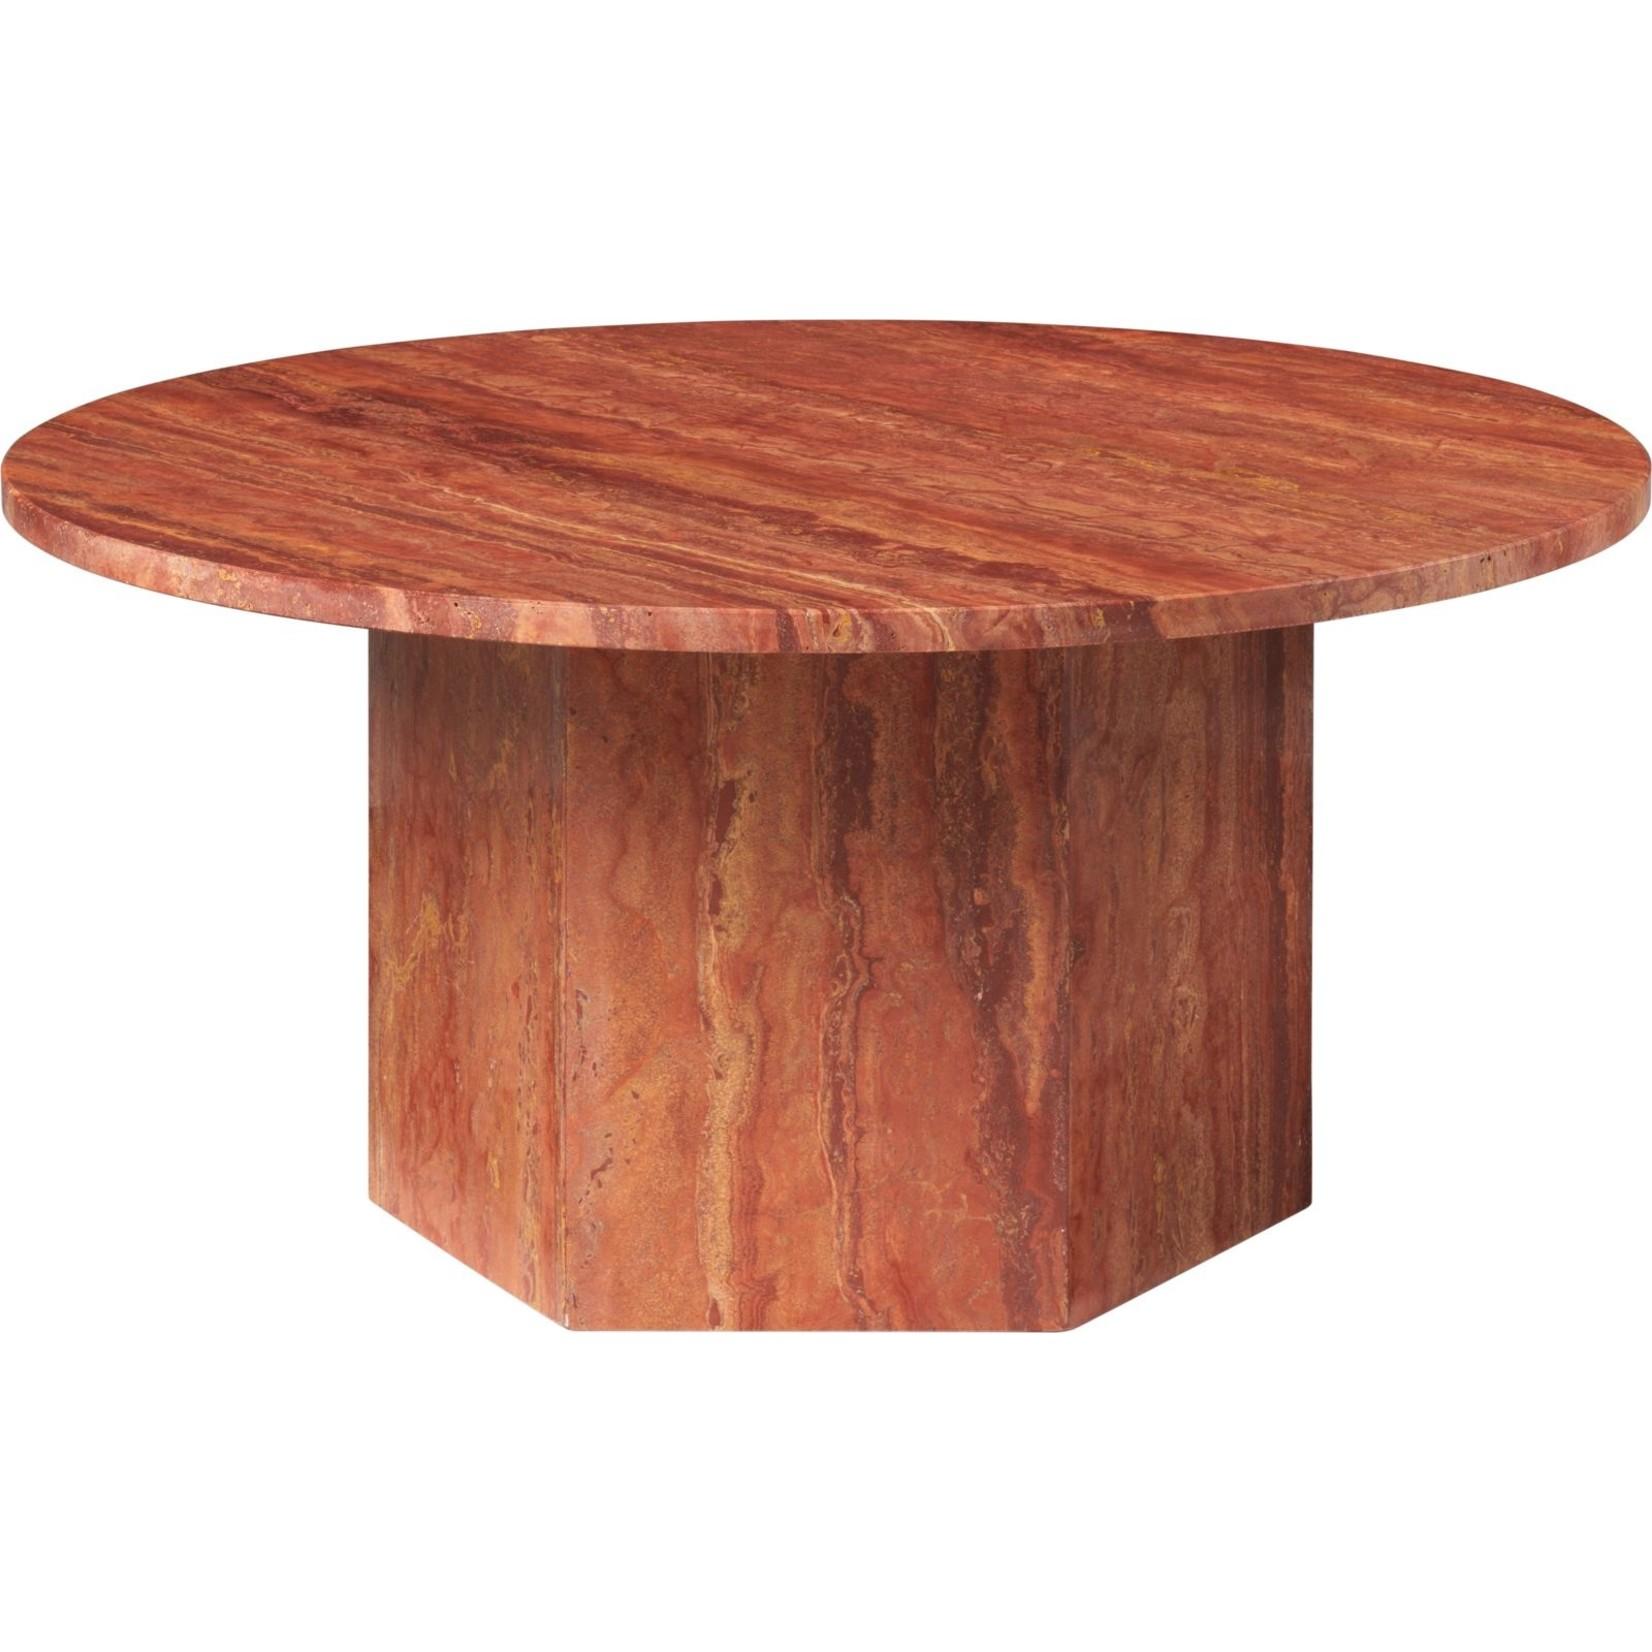 Gubi Table basse Epic ronde Ø80 | Travertin rouge